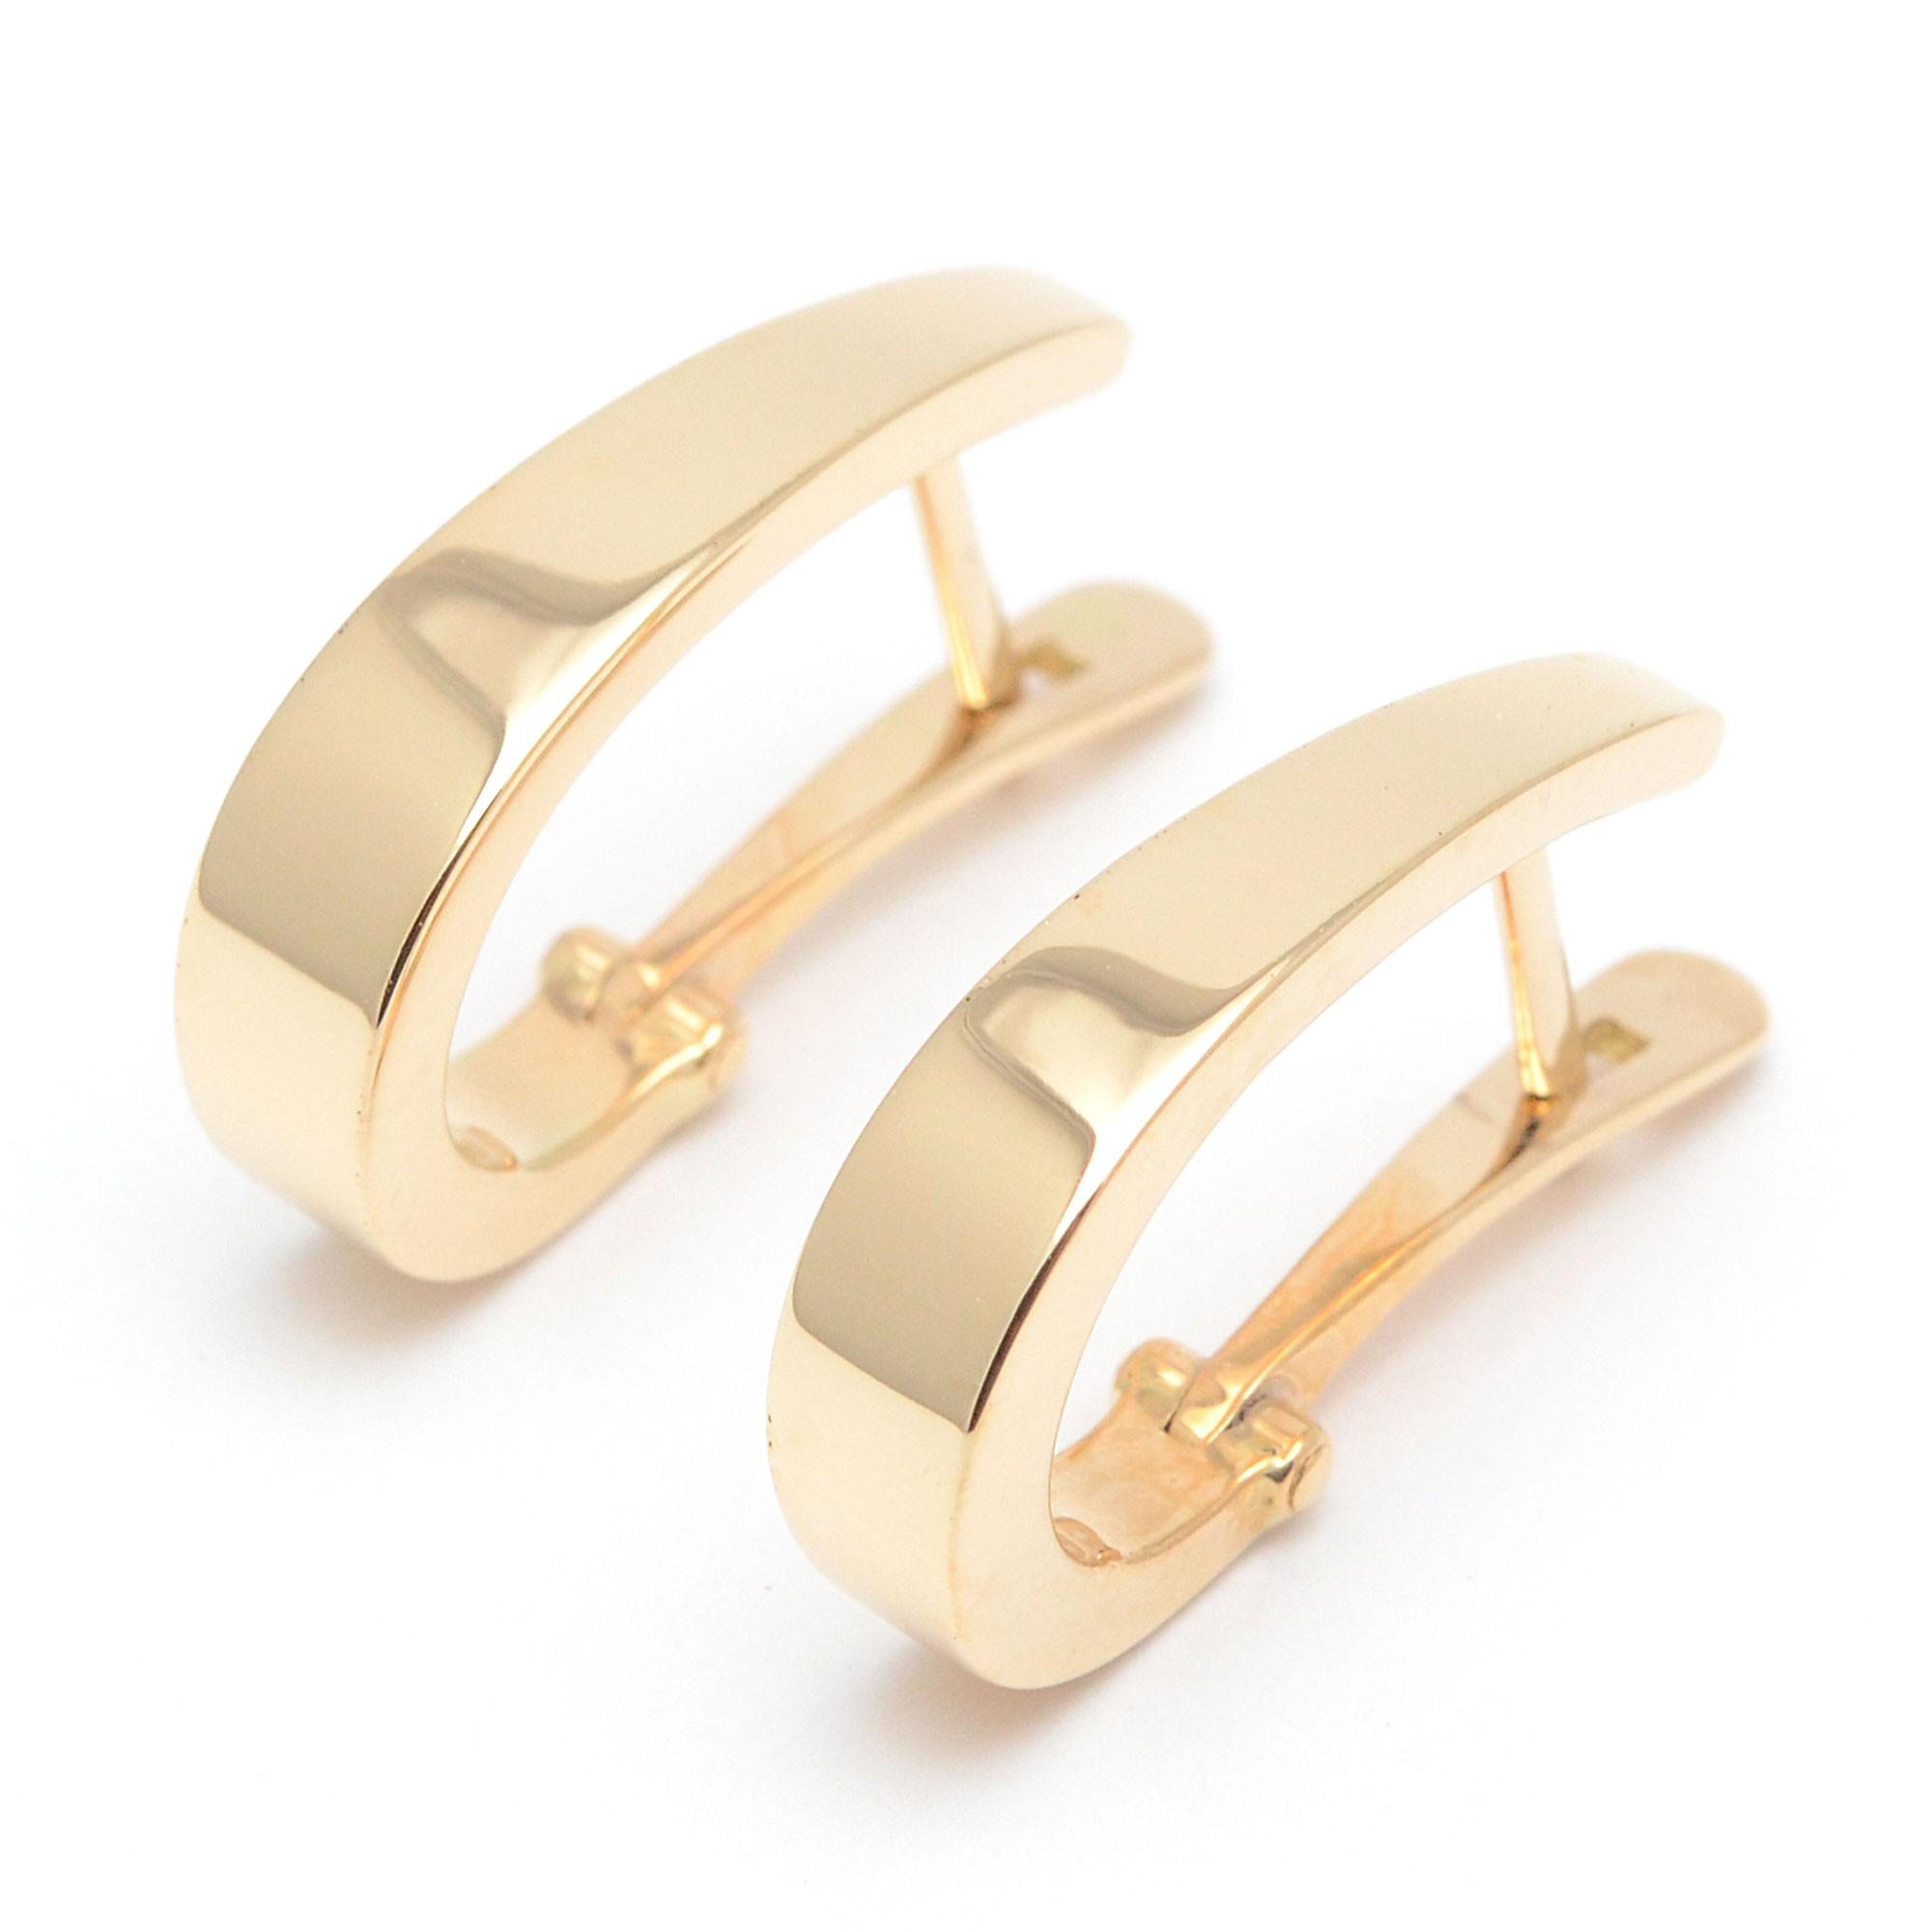 934c9b0d5748 Pendientes de oro de aro criollas diseño moderno